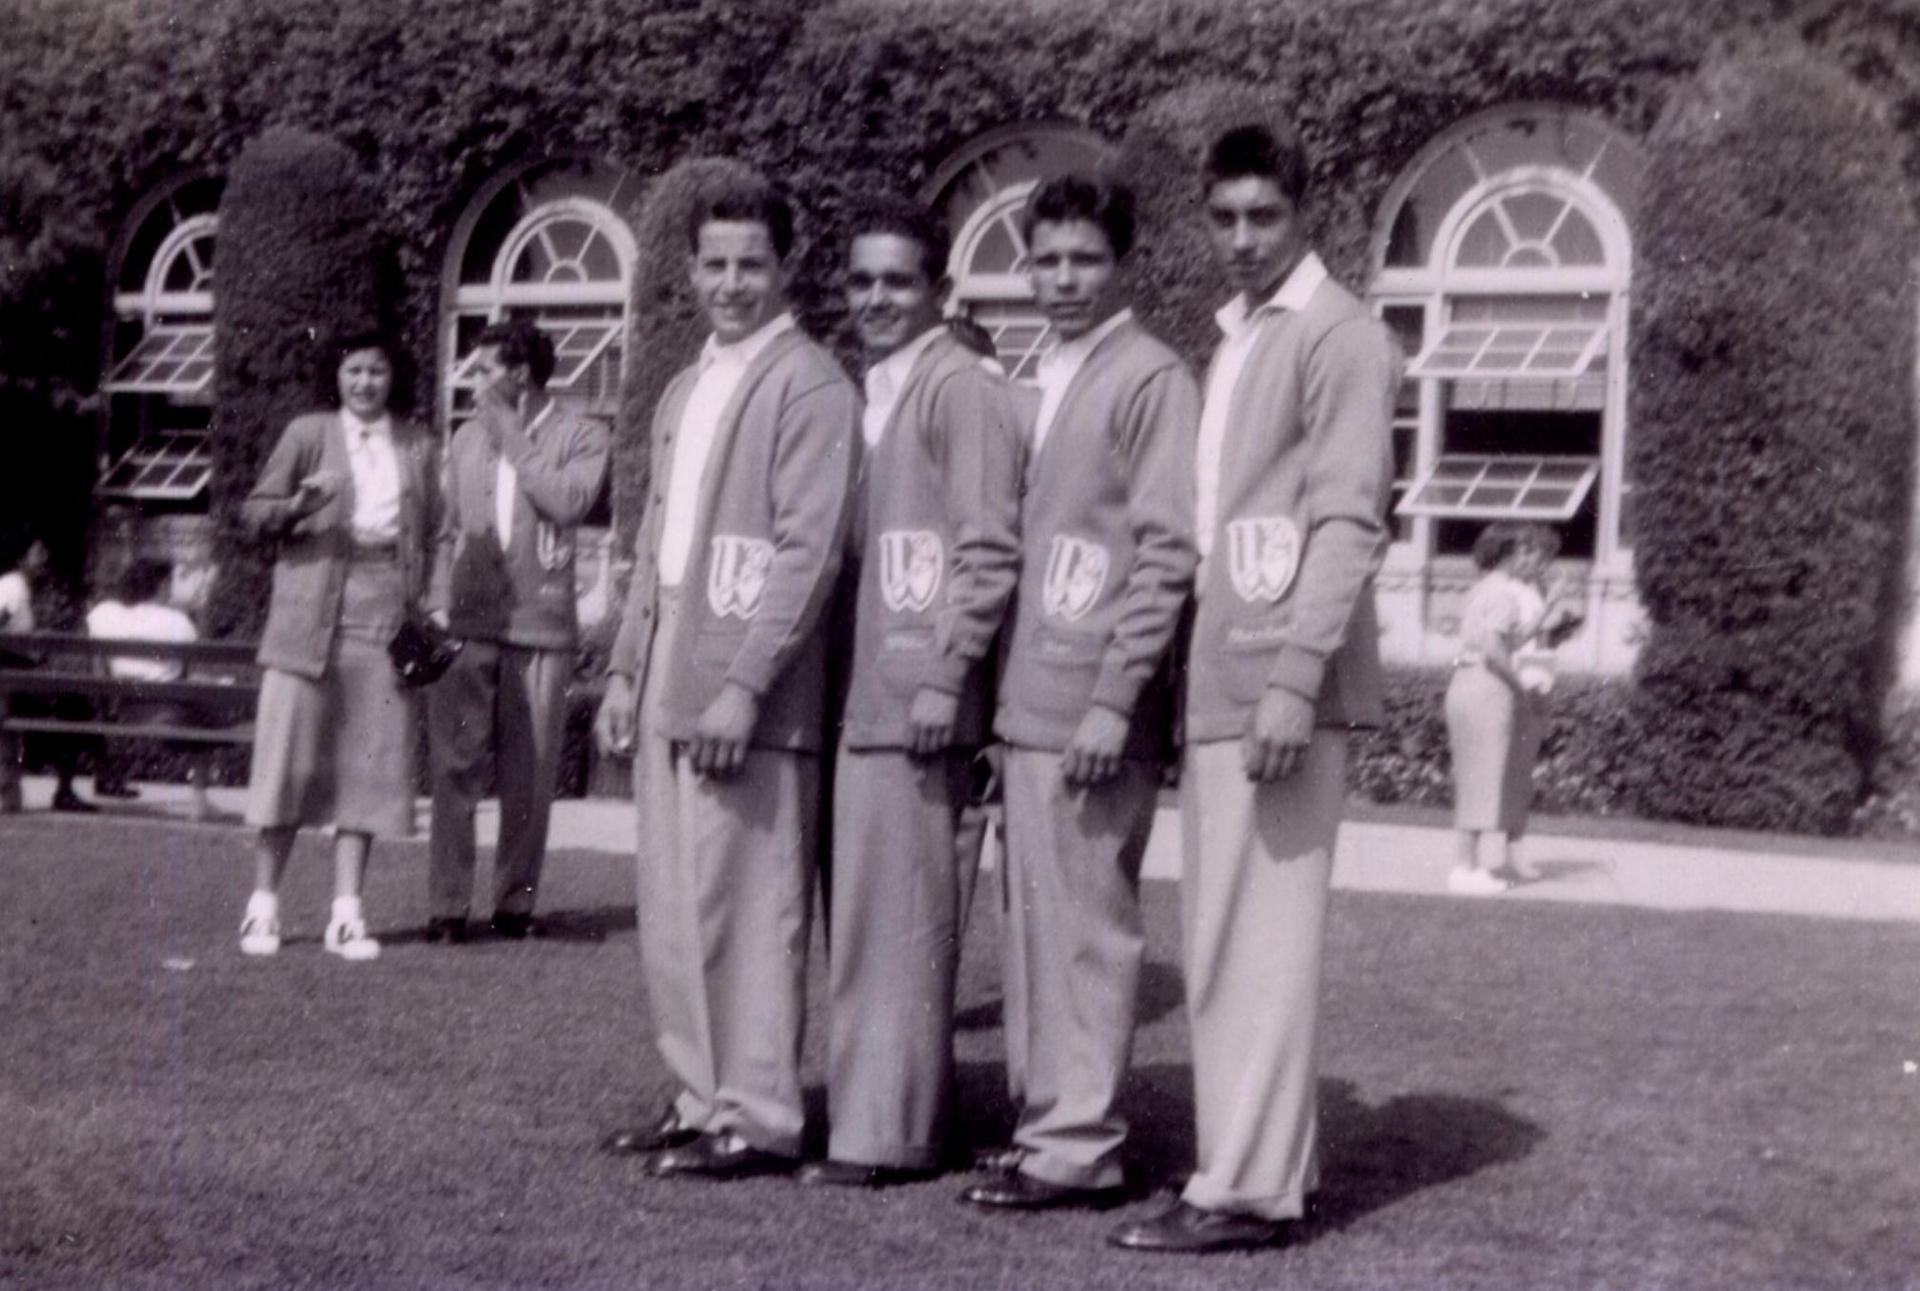 Manuel Rodriguez, William Cruz, Victor Loya and Charlie Mena, 1950